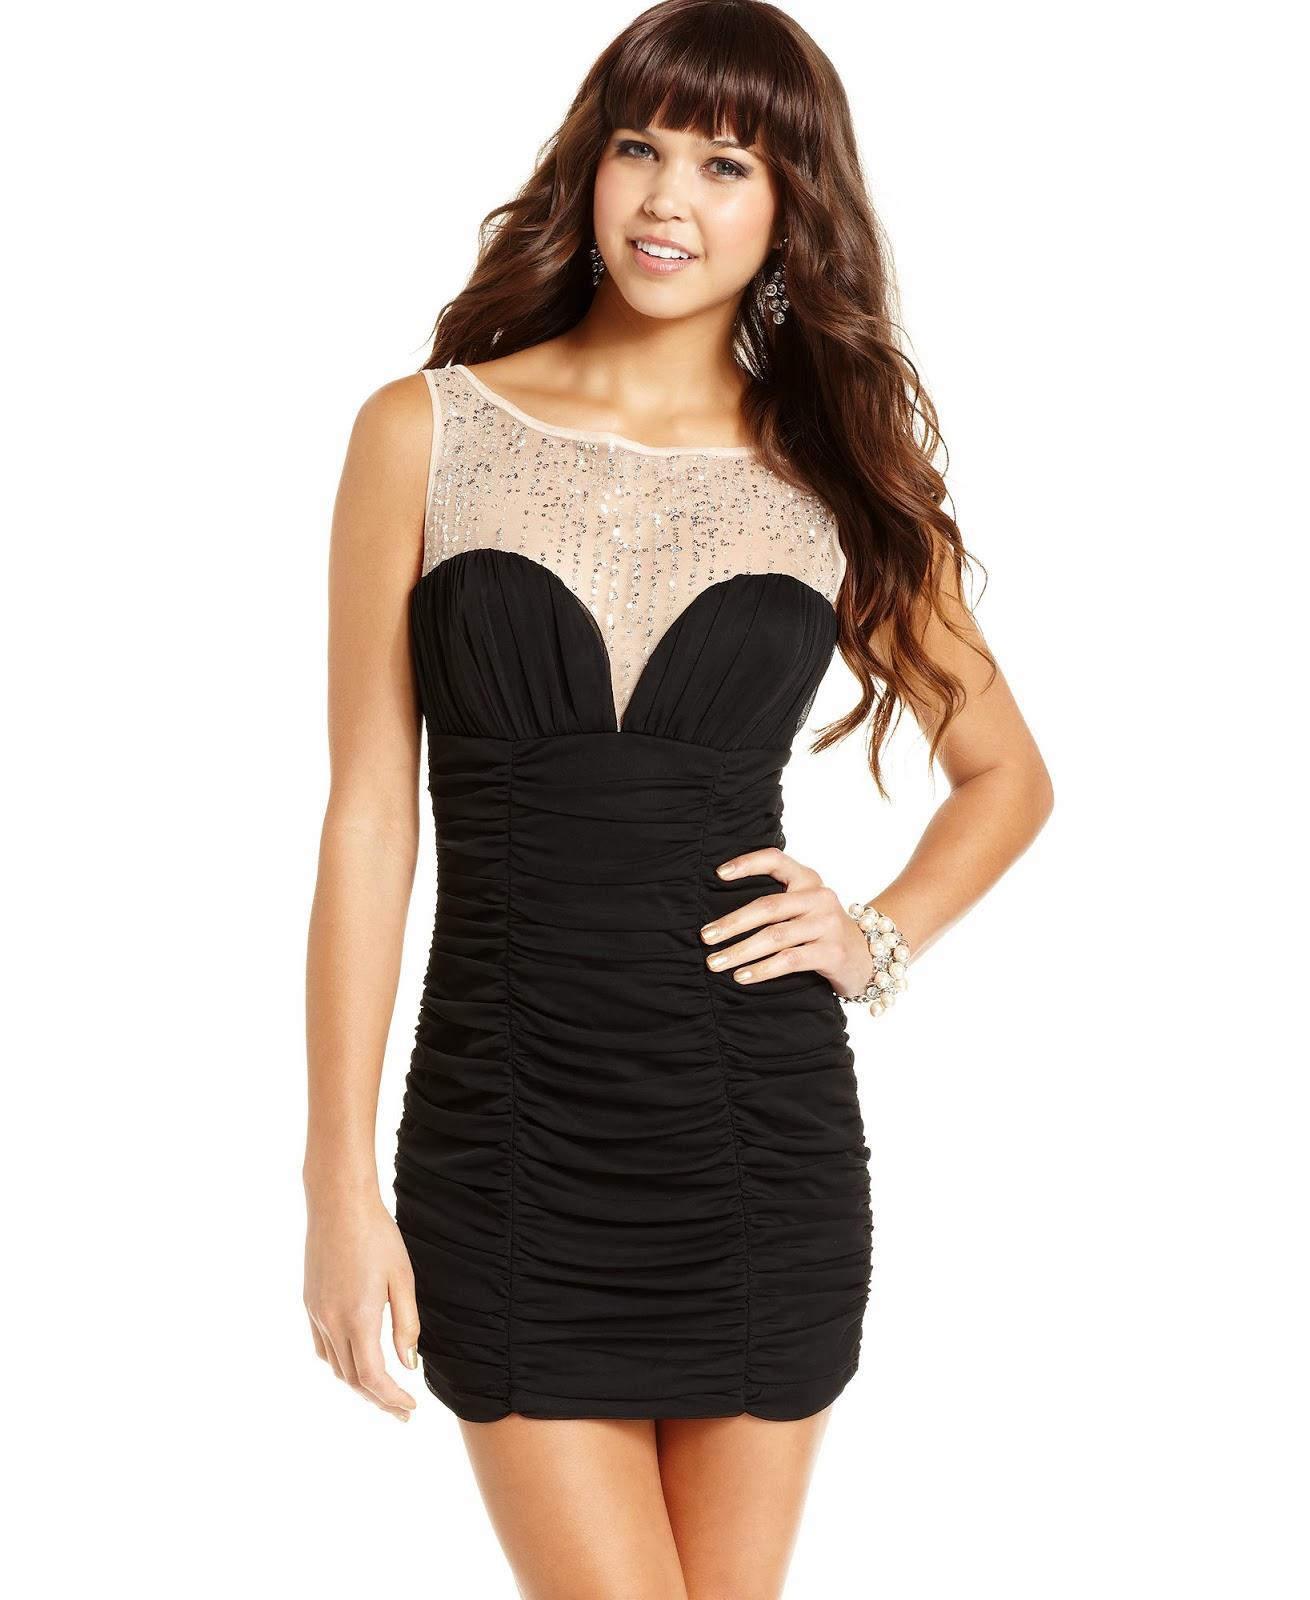 Macys Womens Dresses - Laura Williams